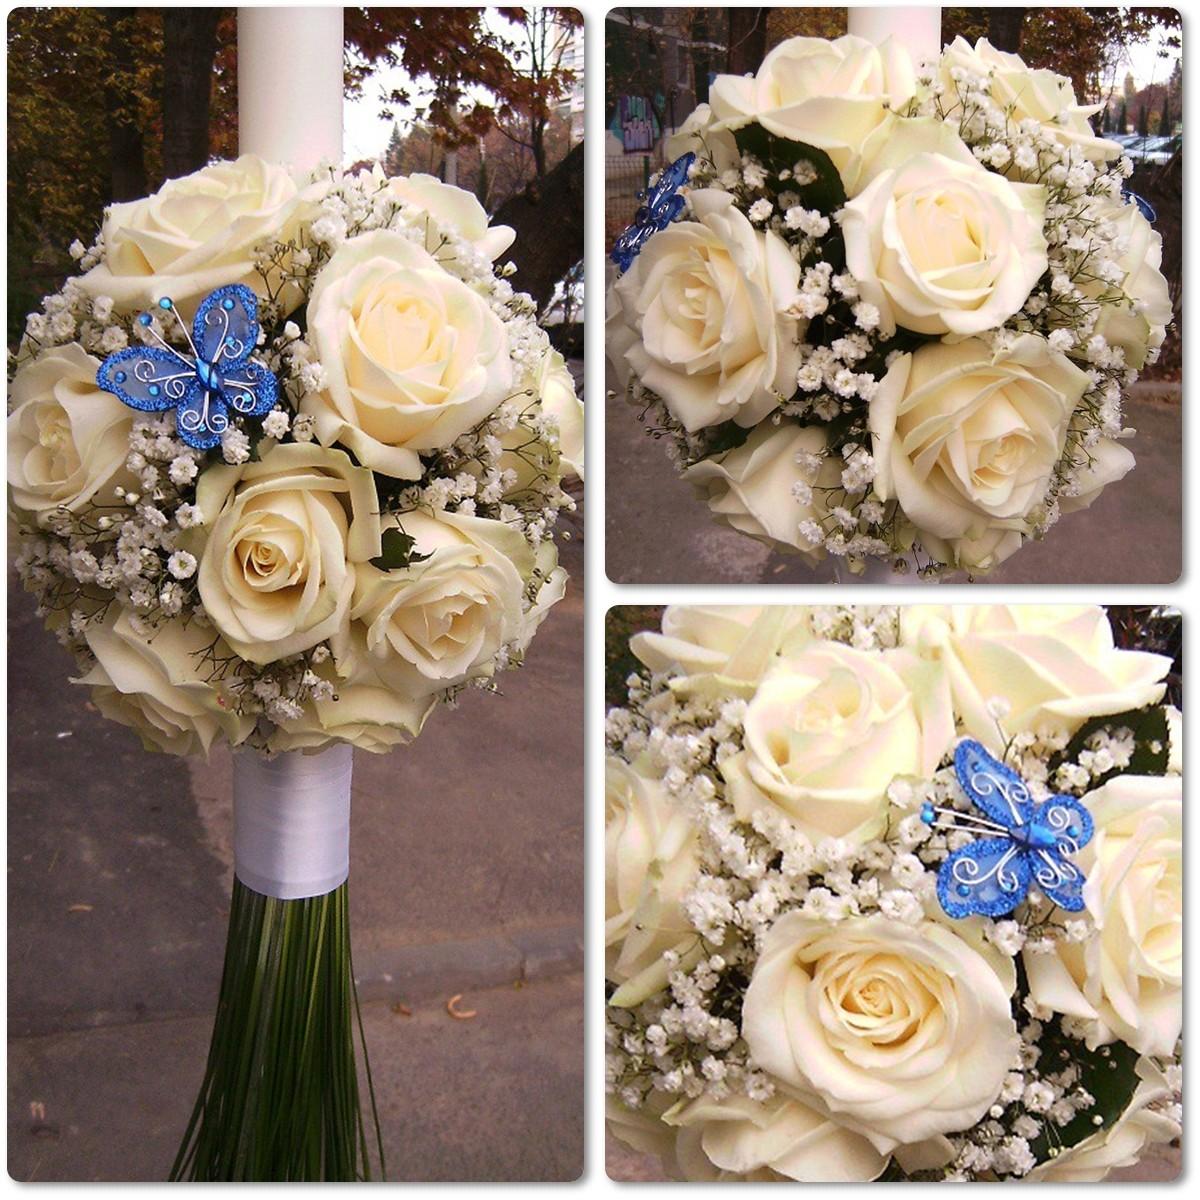 Lumanare De Botez Glob Din Trandafiri Albi Floraria Design Floral